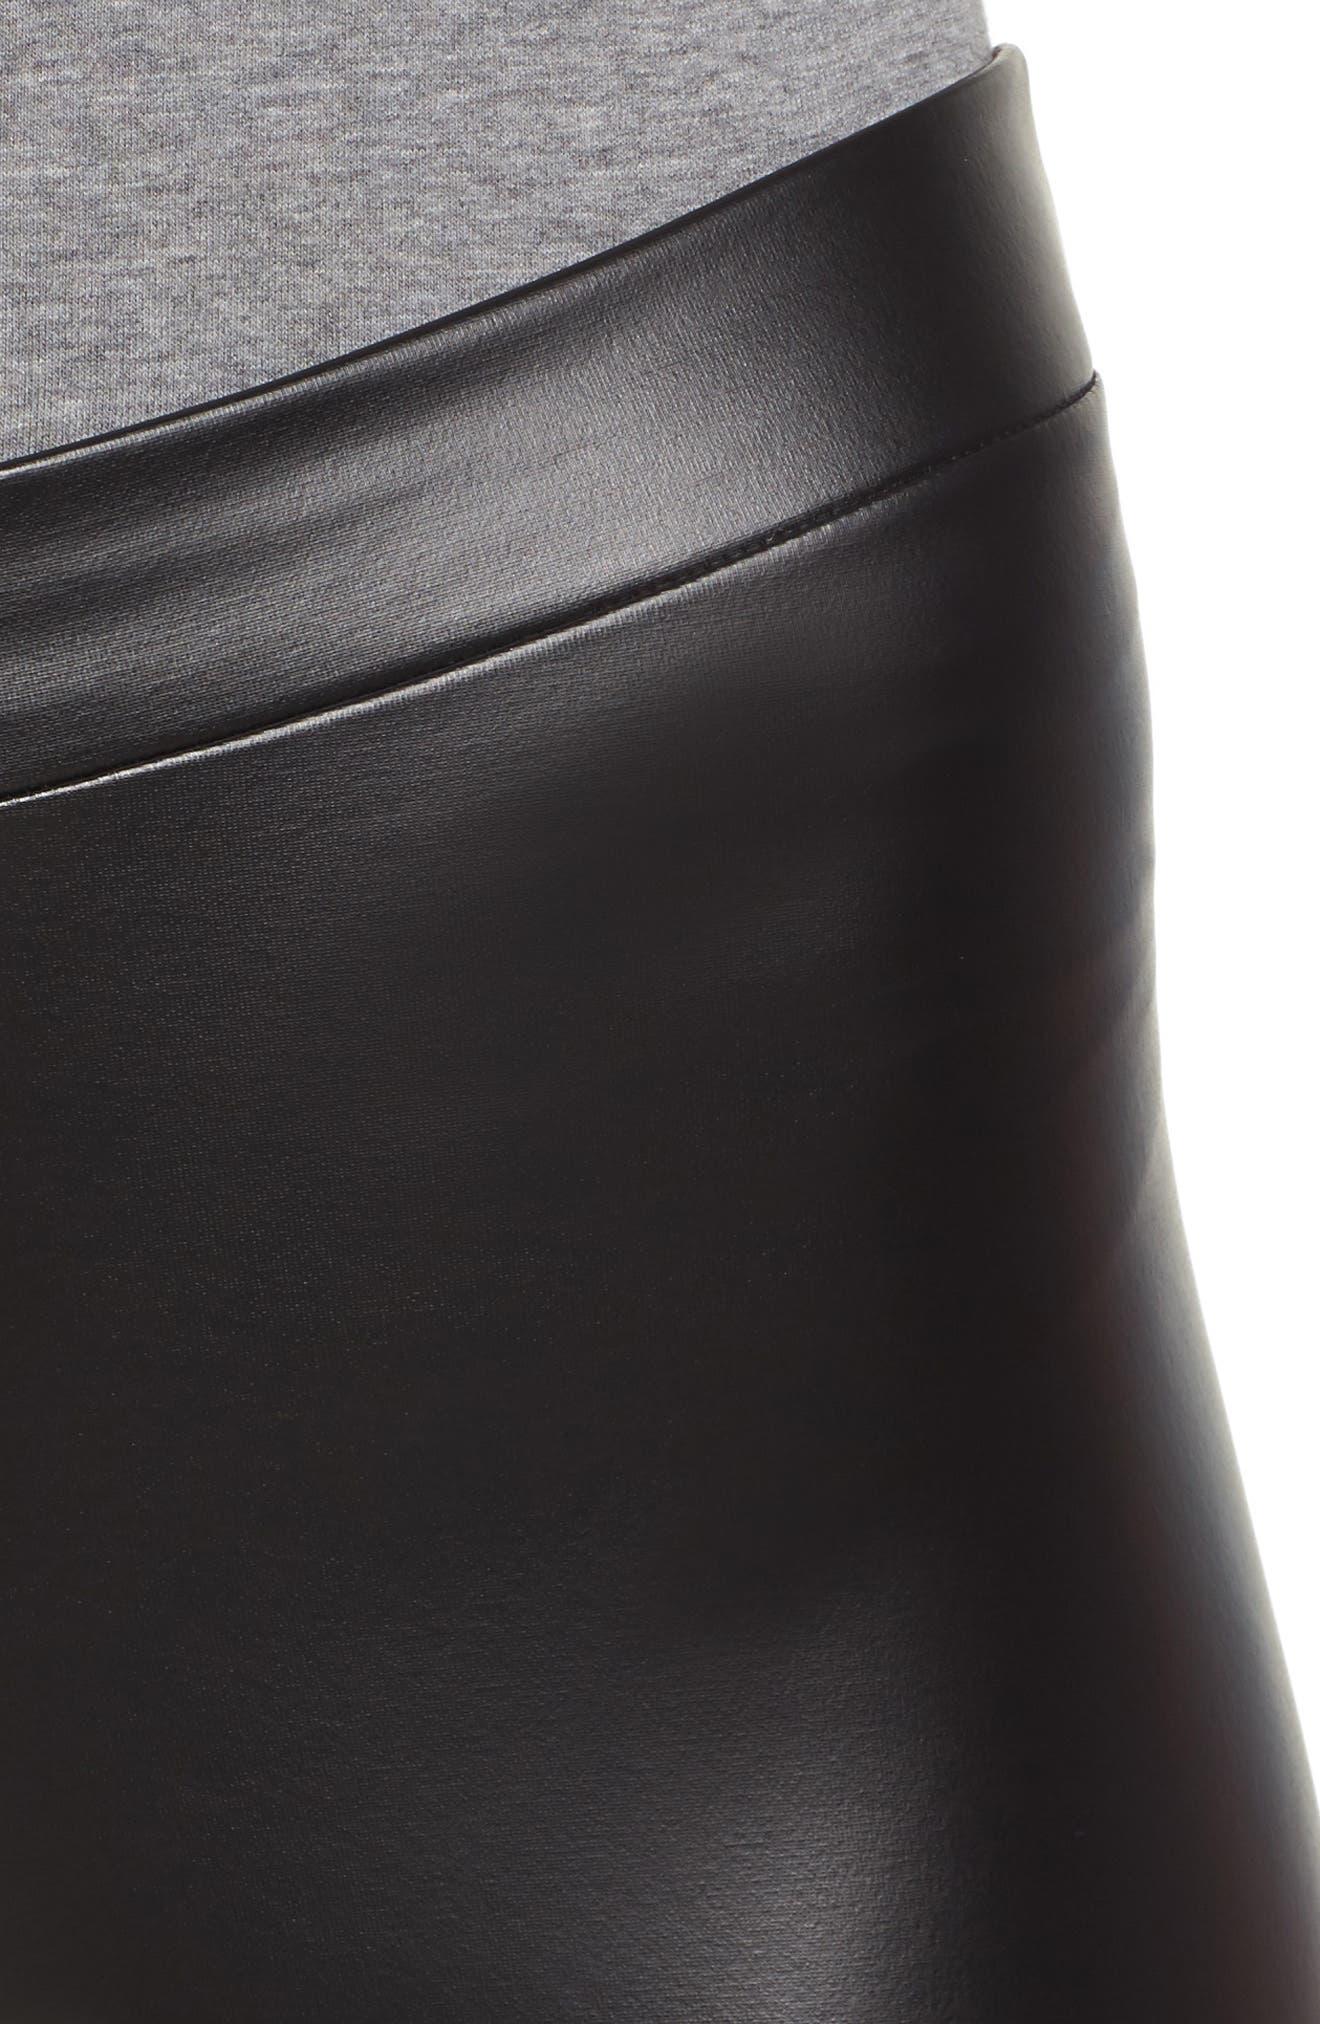 Plush Lined Faux Leather Leggings,                             Alternate thumbnail 4, color,                             001